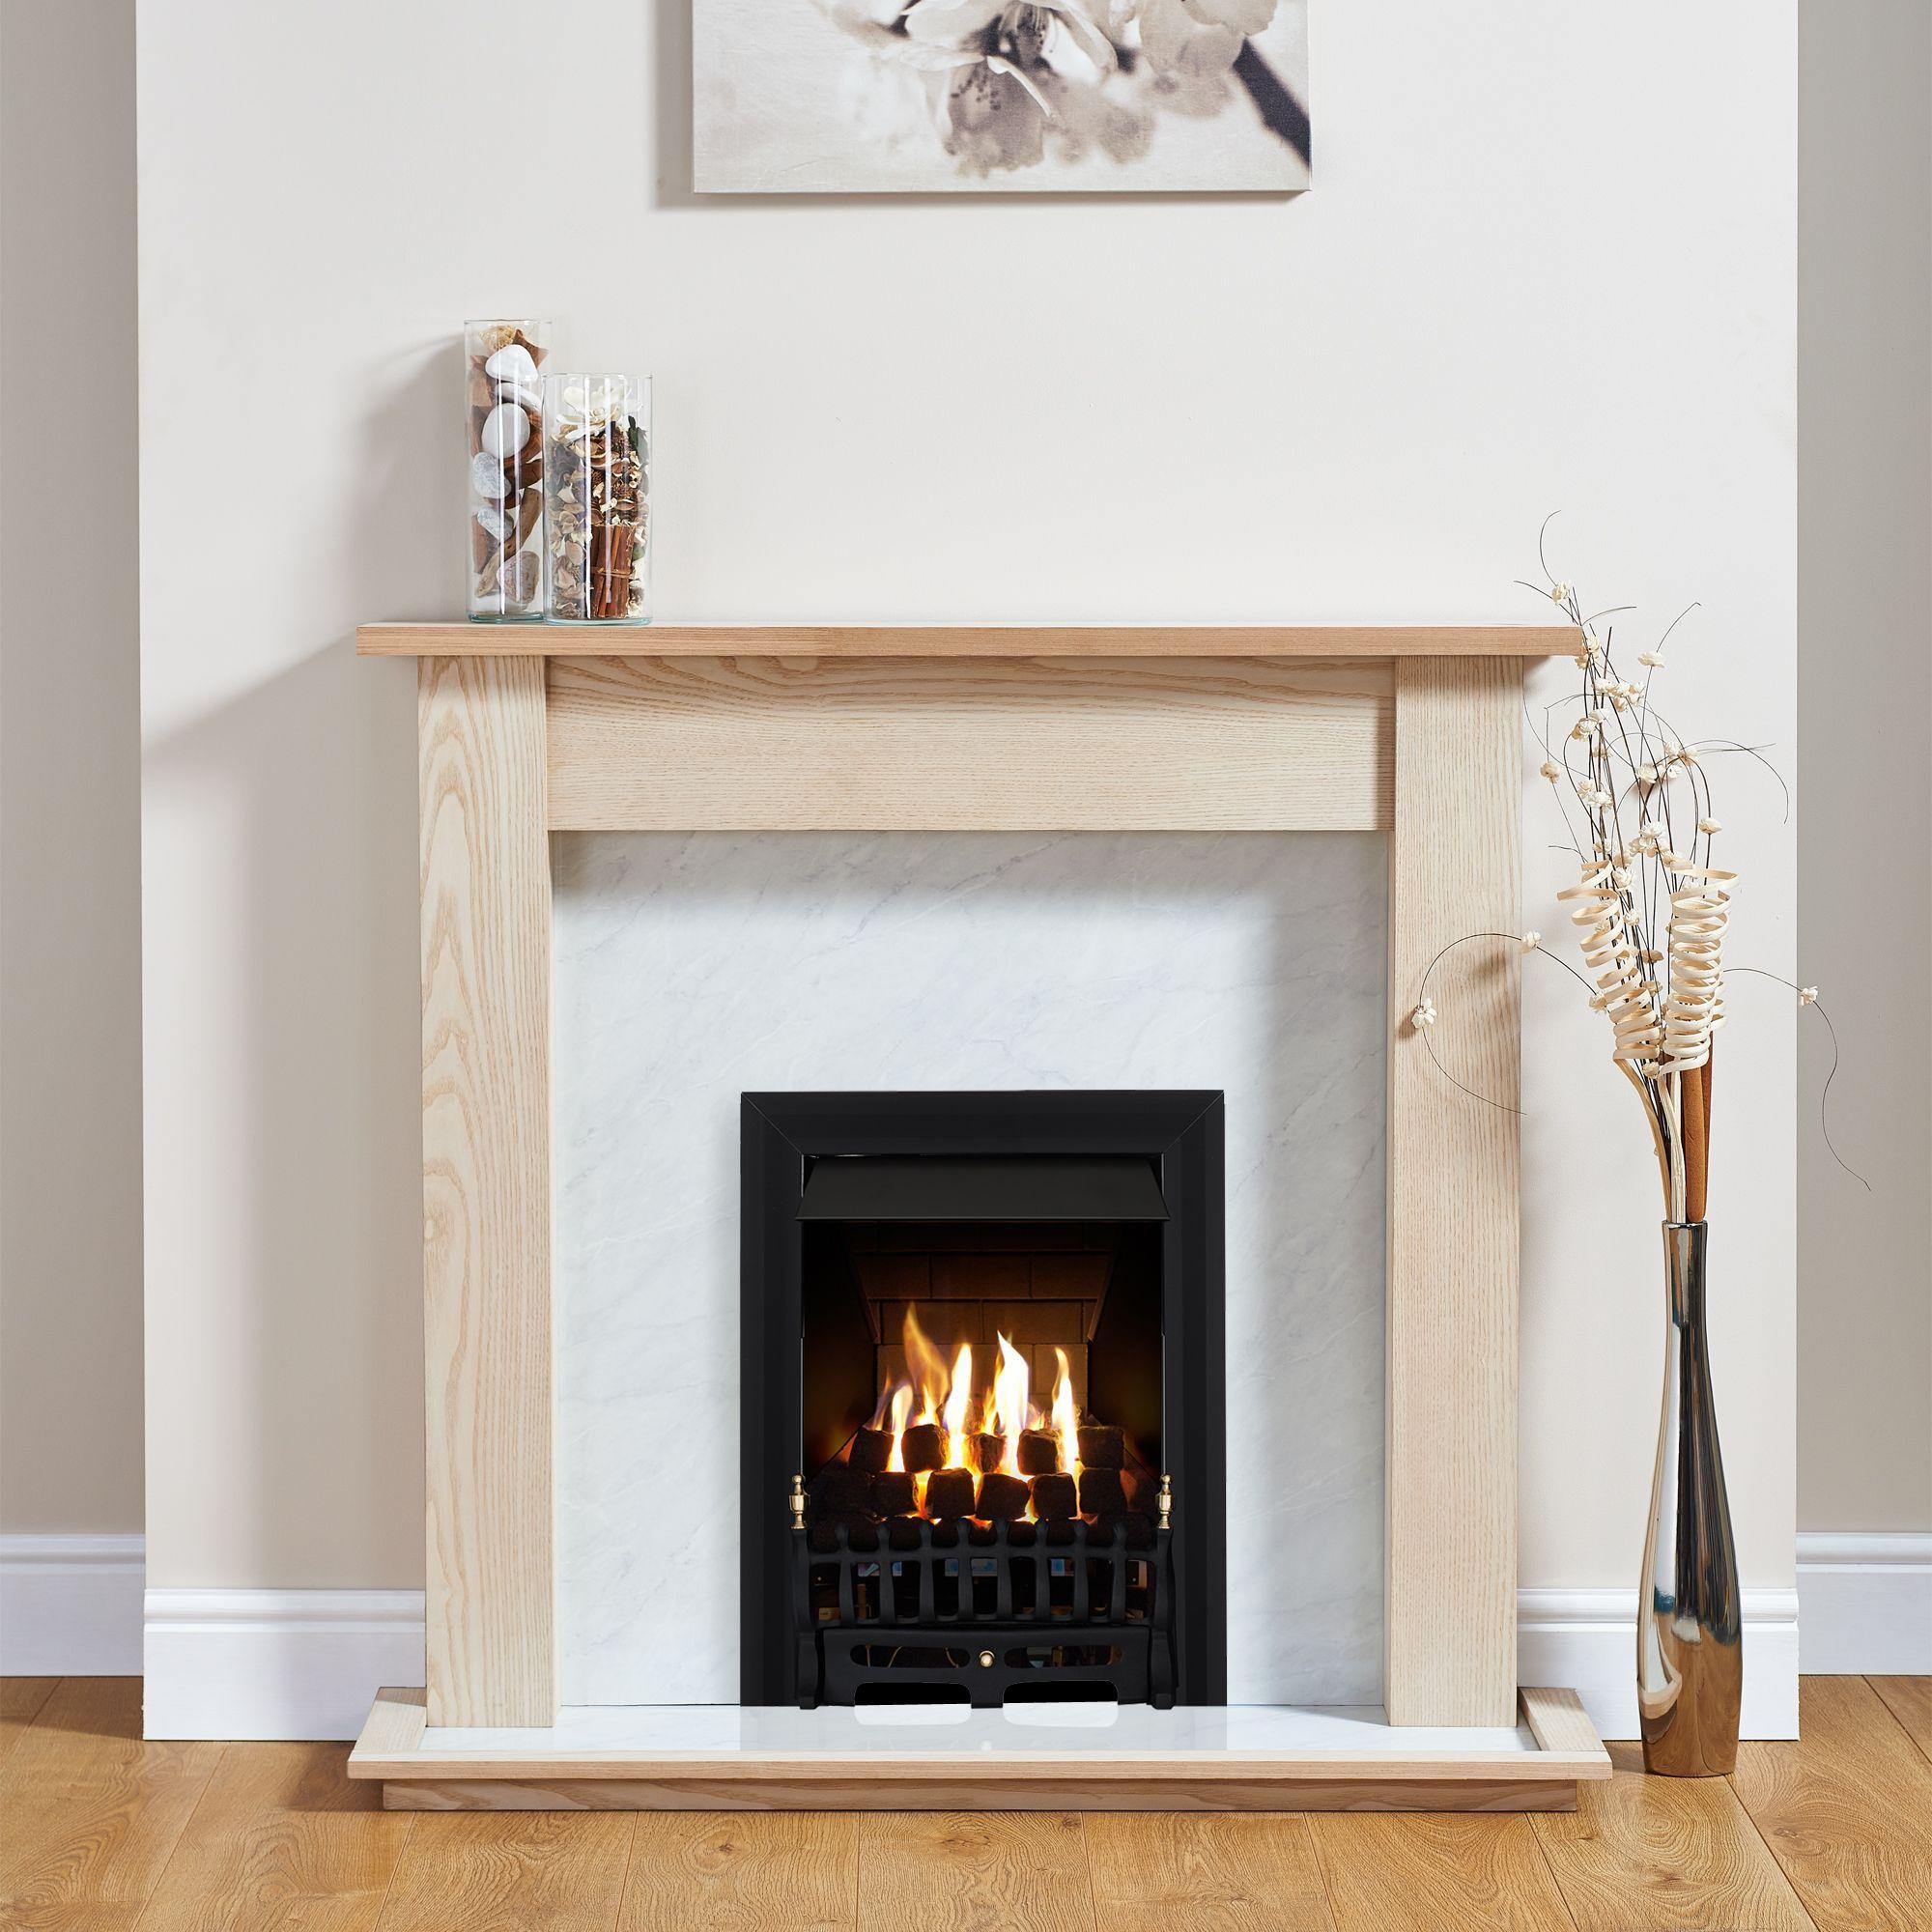 Focal Point Blenheim Black Inset Gas Fire Suite